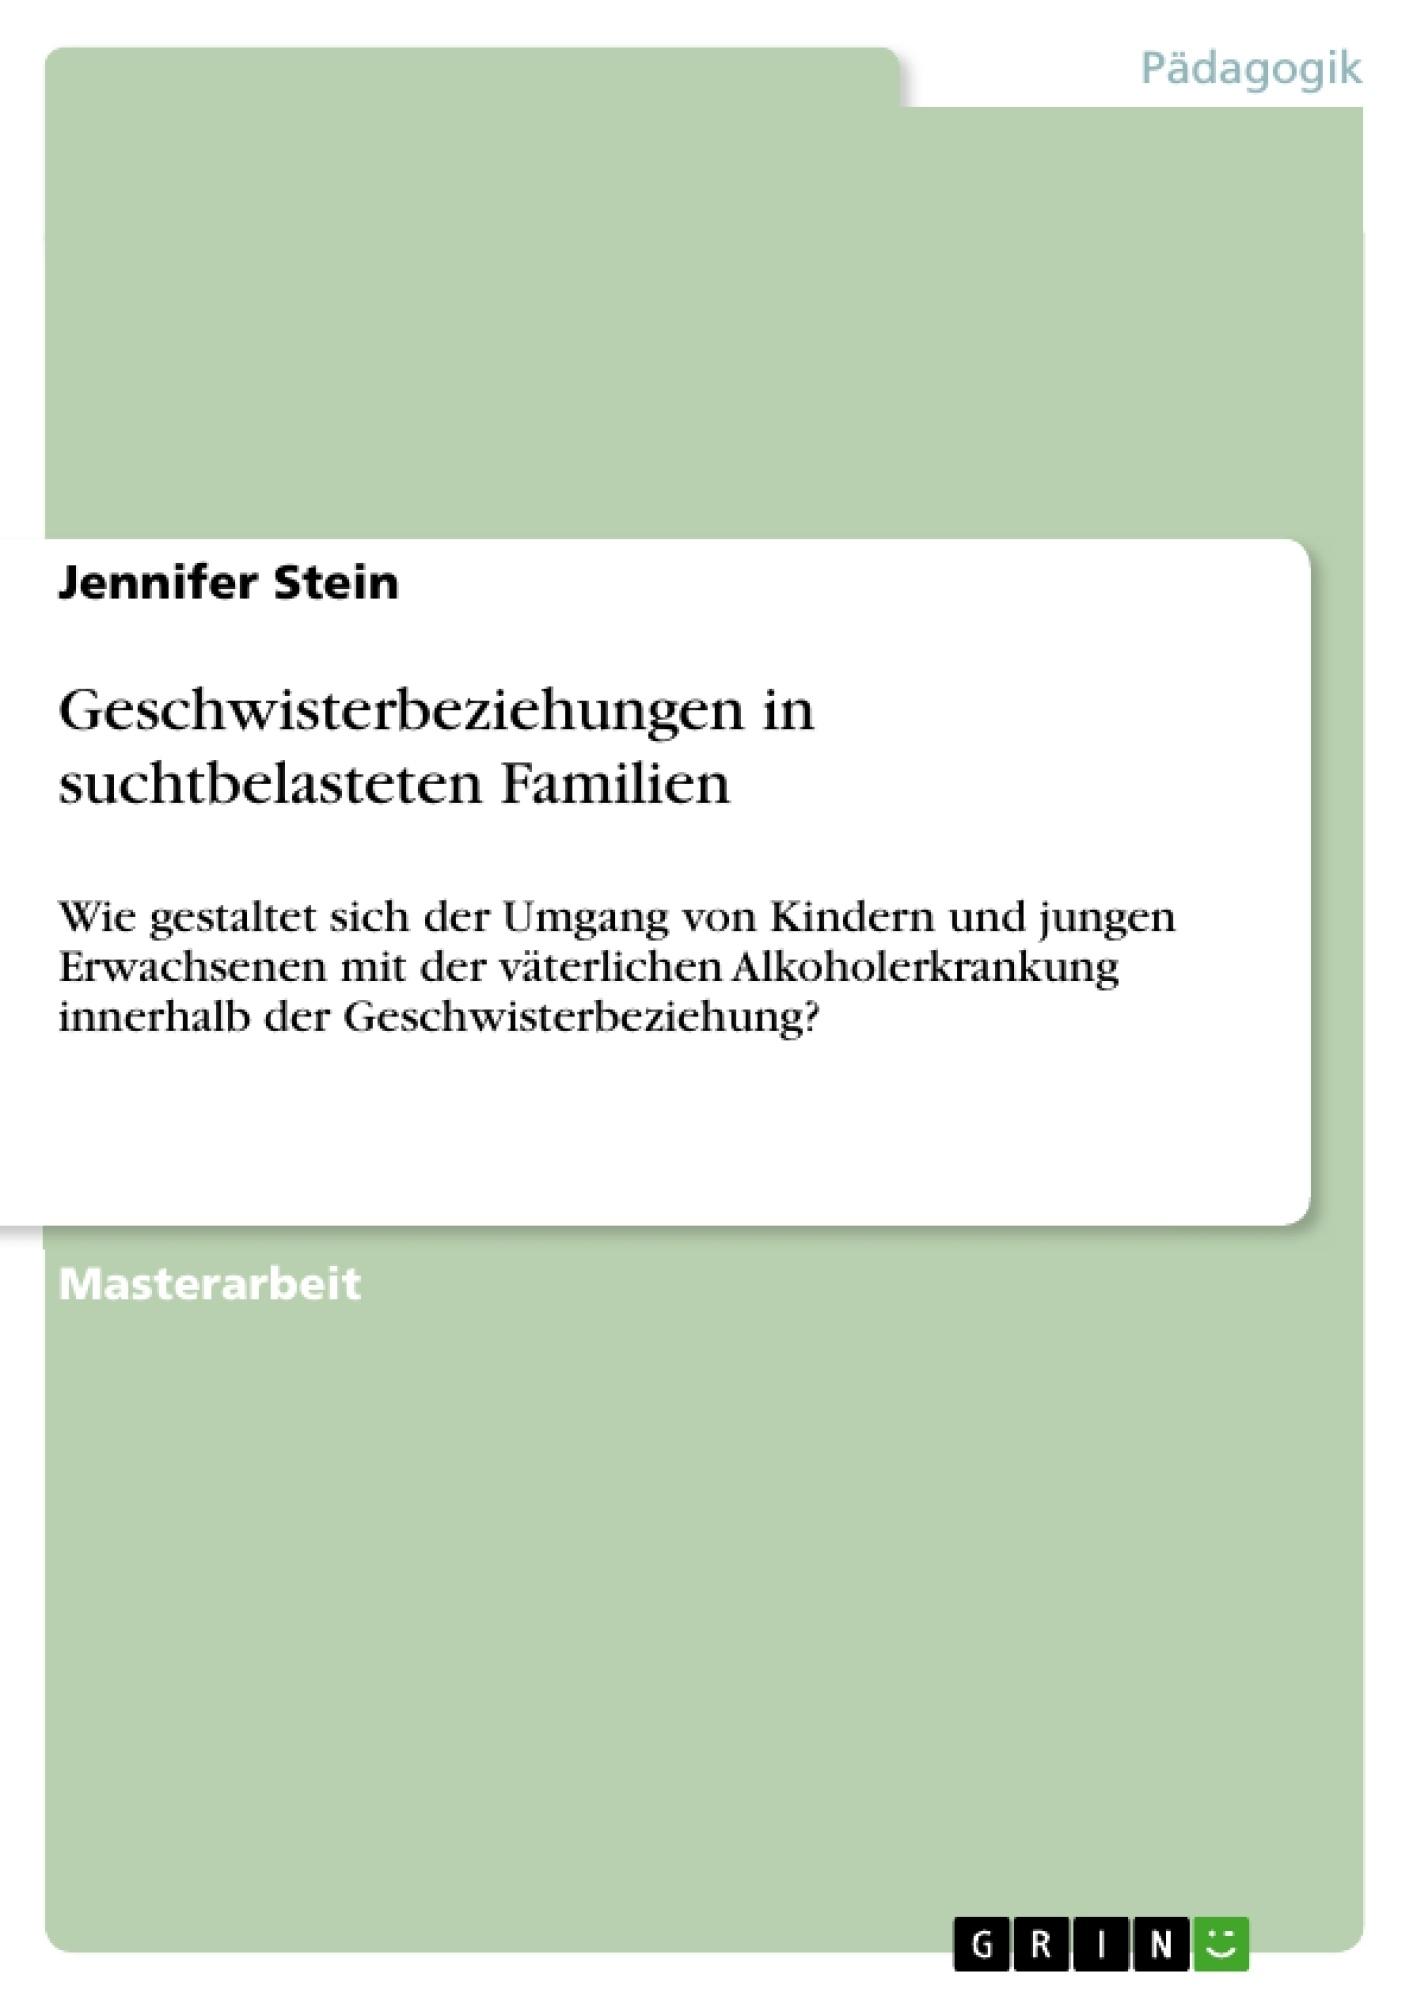 Titel: Geschwisterbeziehungen in suchtbelasteten Familien